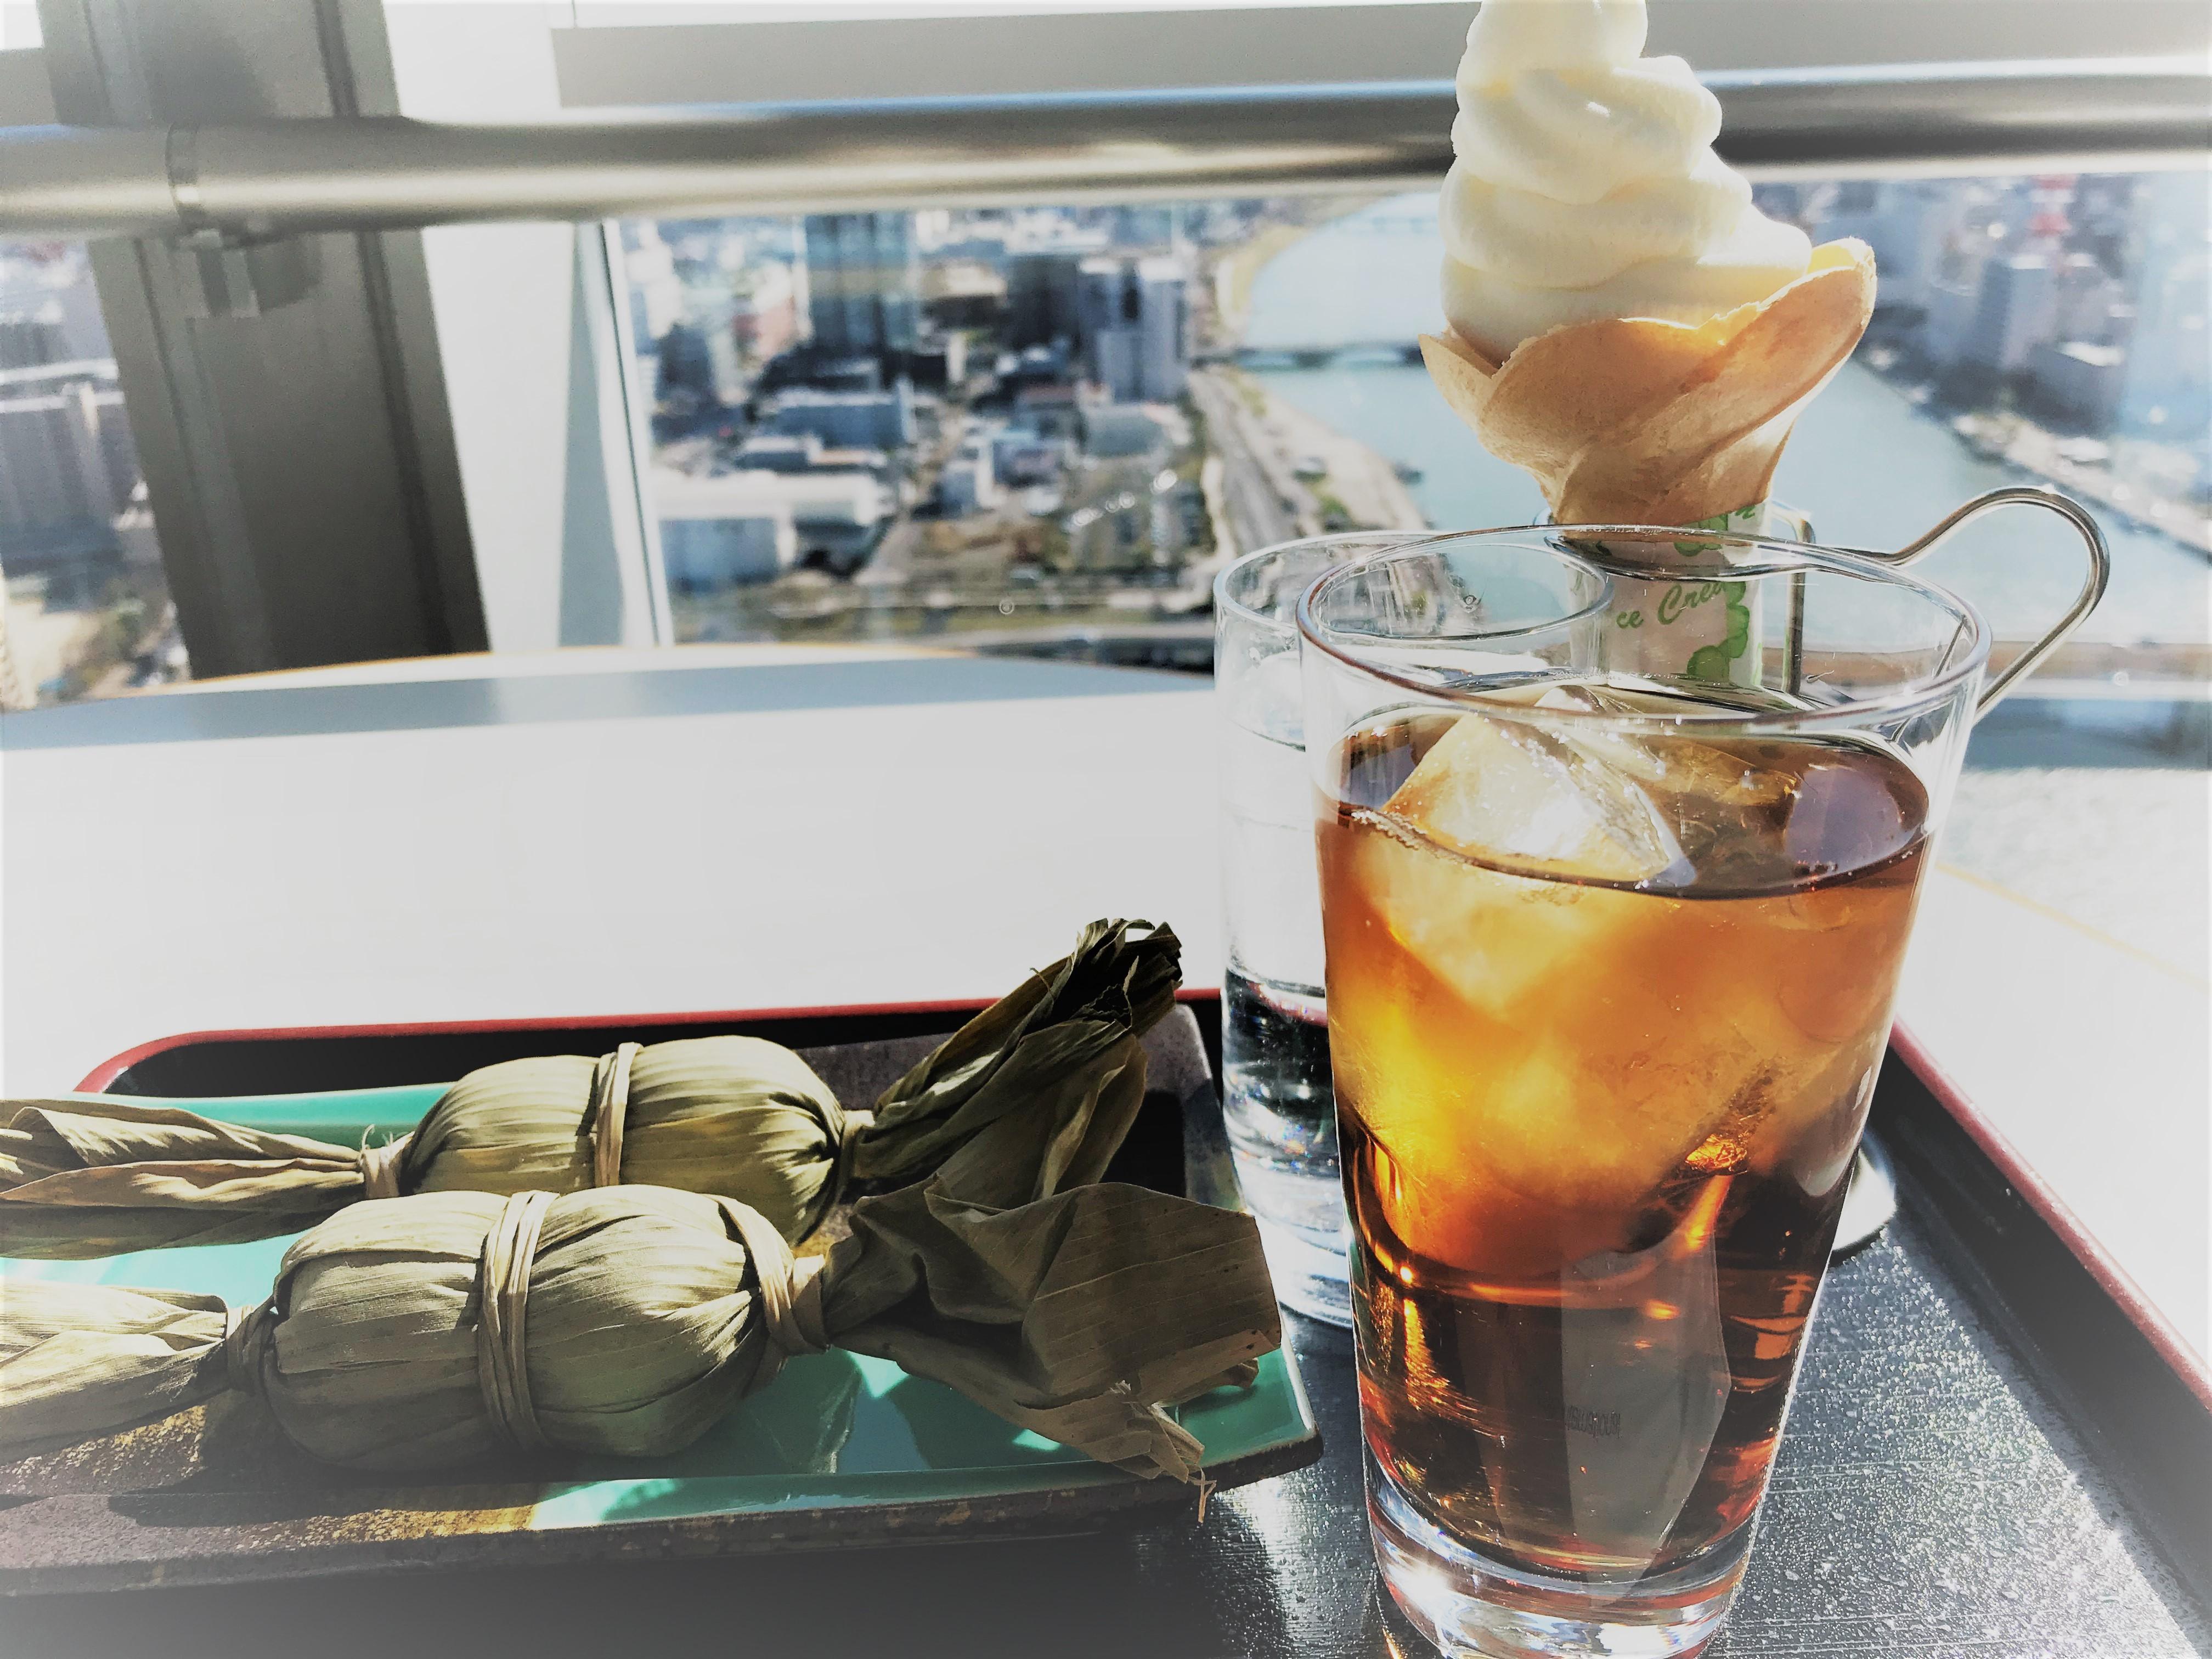 PANORAMA 笹団子とウーロン茶のセット